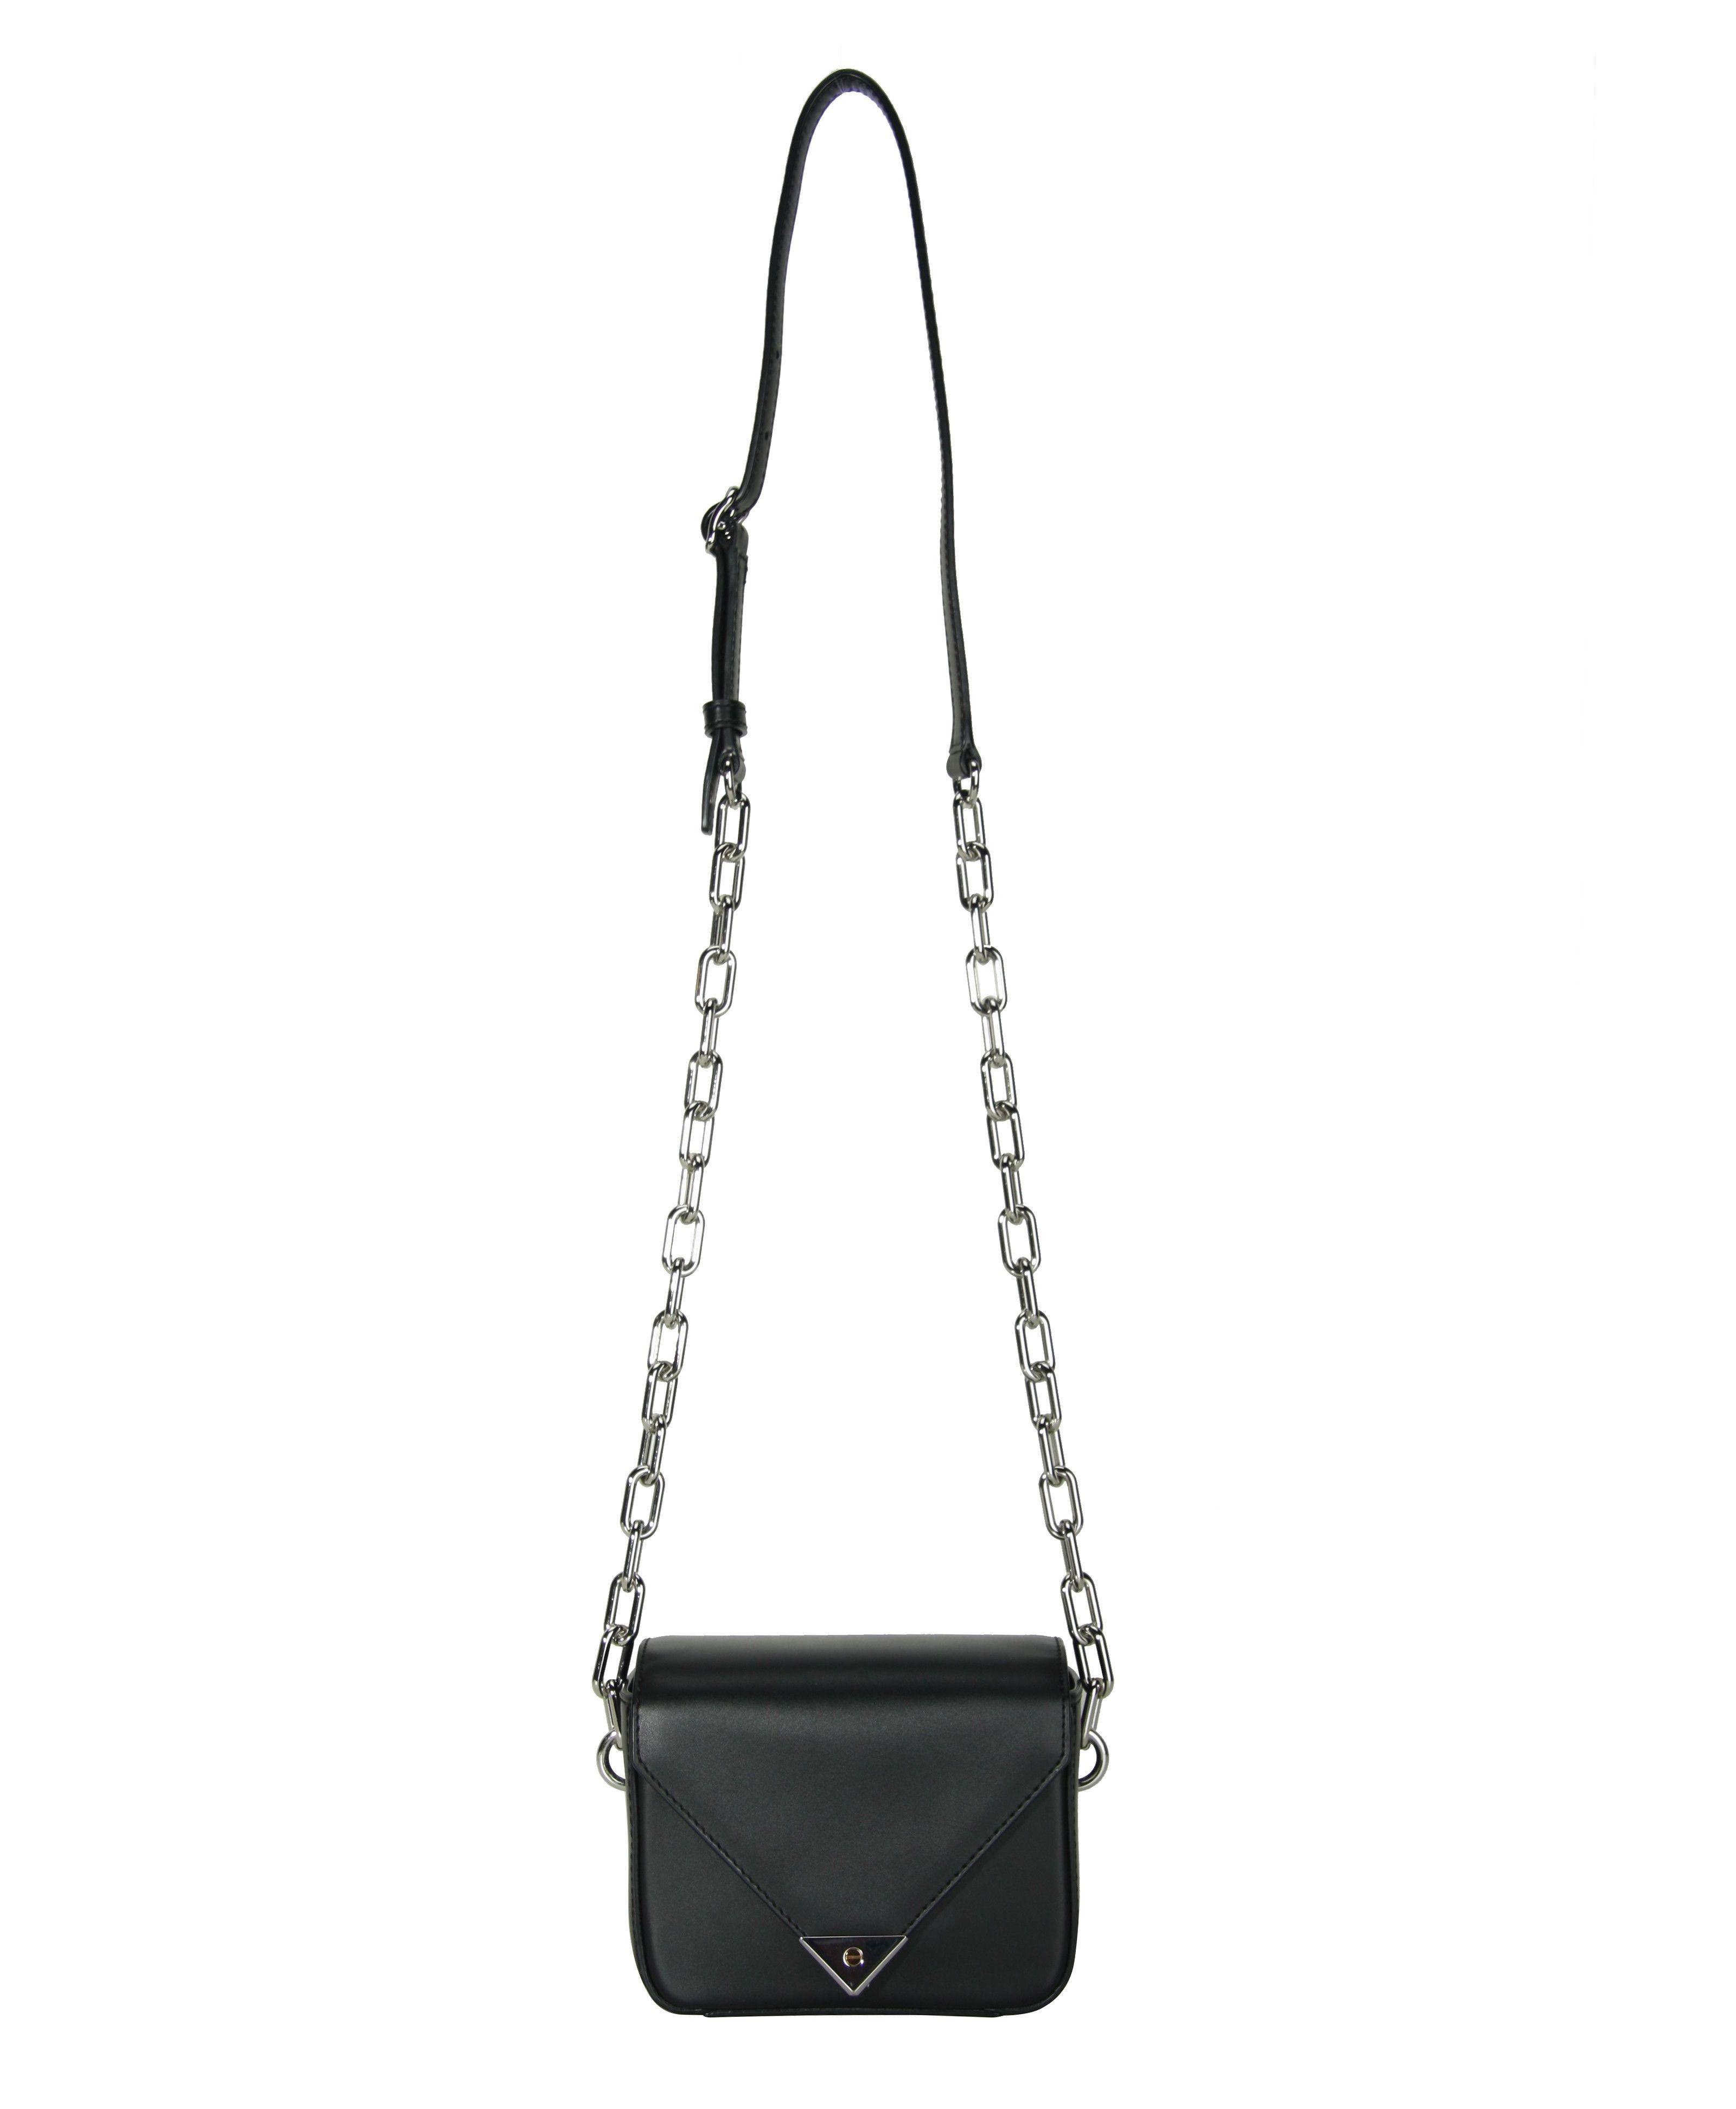 Alexander Wang Black Chain Cross Body Prisma Bag